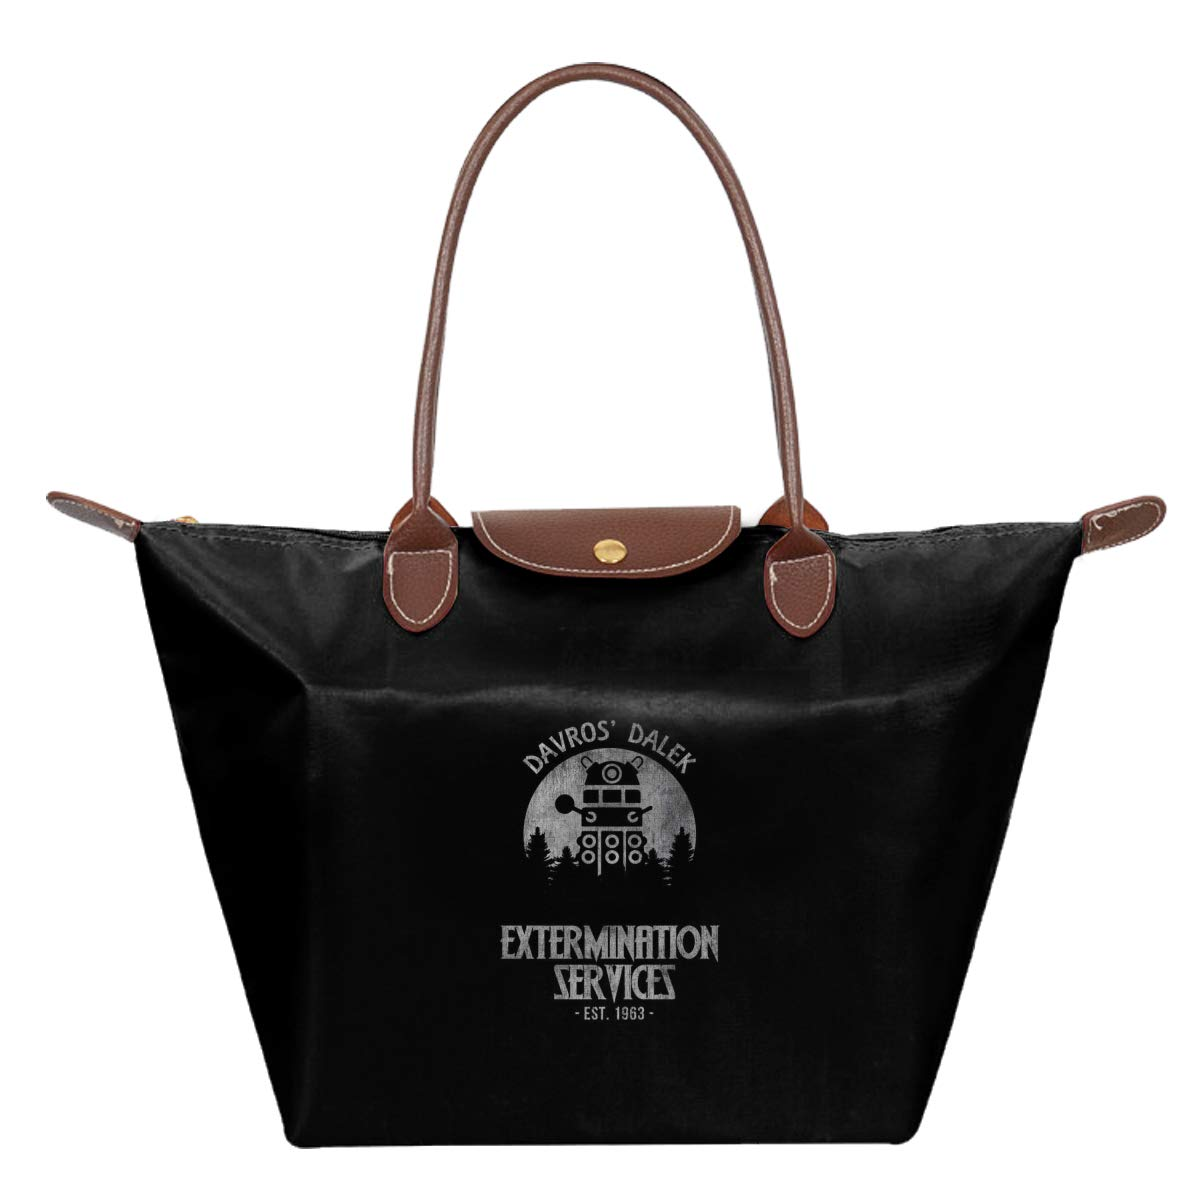 Davros Dalek Extermination Services Doctor Who Waterproof Leather Folded Messenger Nylon Bag Travel Tote Hopping Folding School Handbags